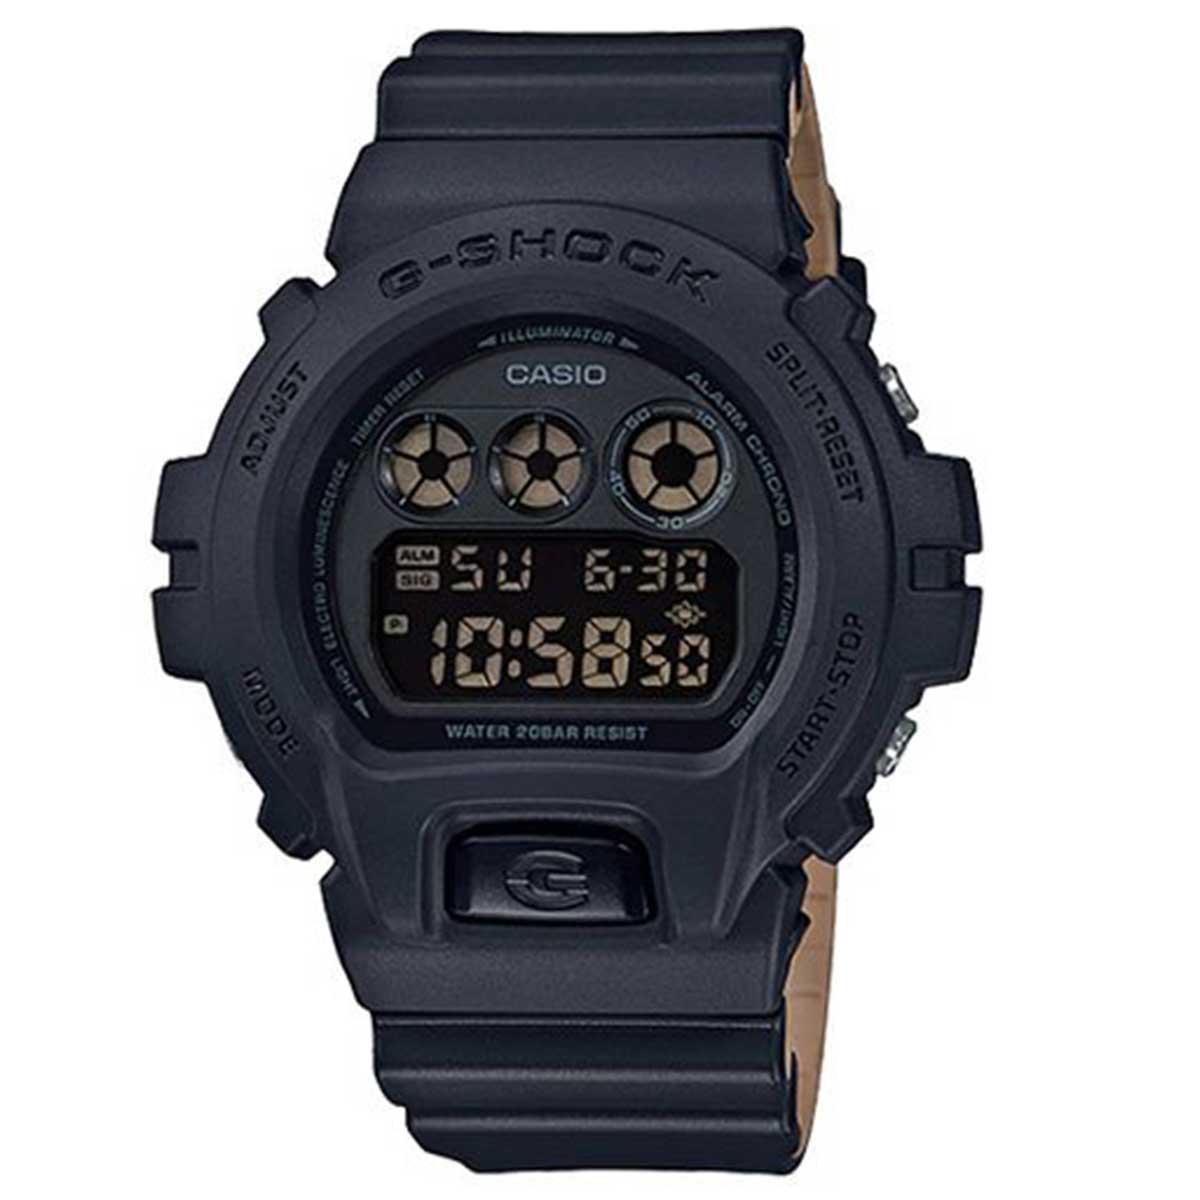 Relógio de Pulso Casio G-Shock DW-6900LU-1DR